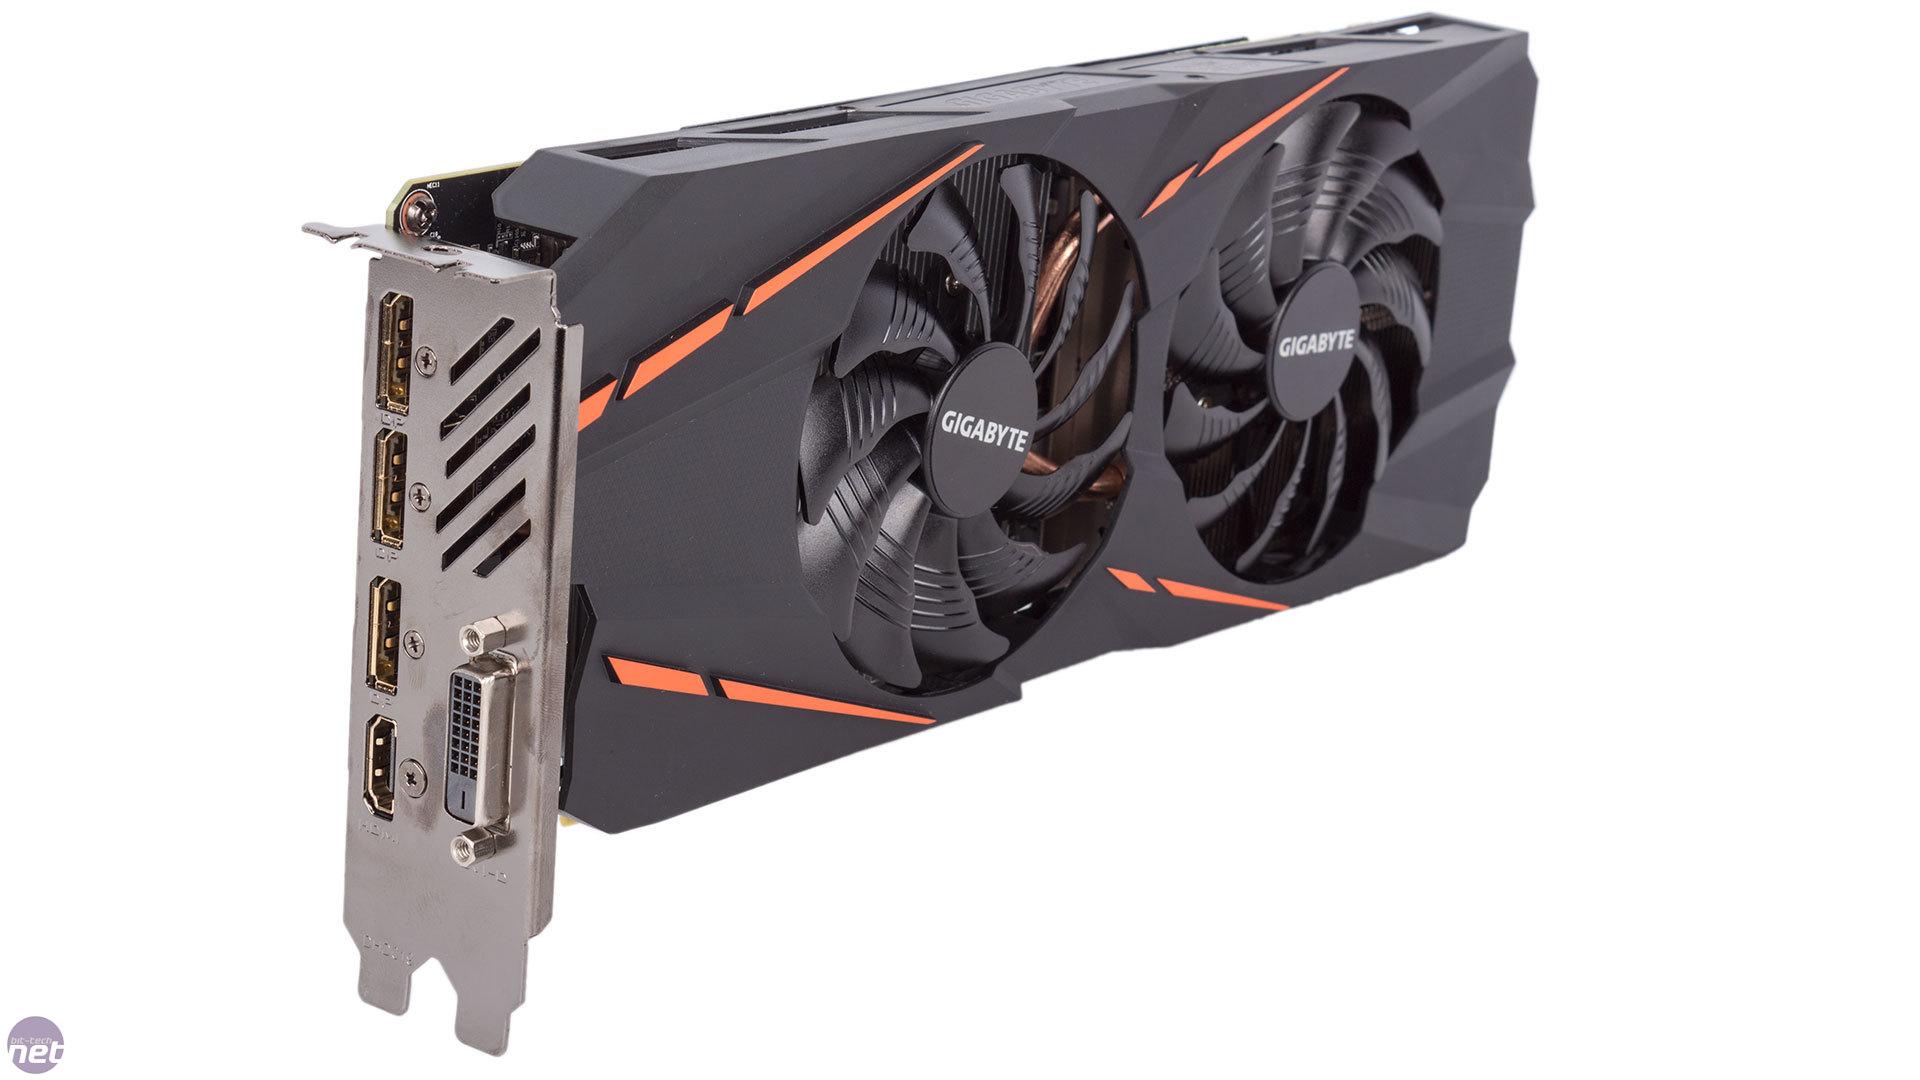 Gigabyte GeForce GTX 1060 G1 Gaming 6GB Review   bit-tech net